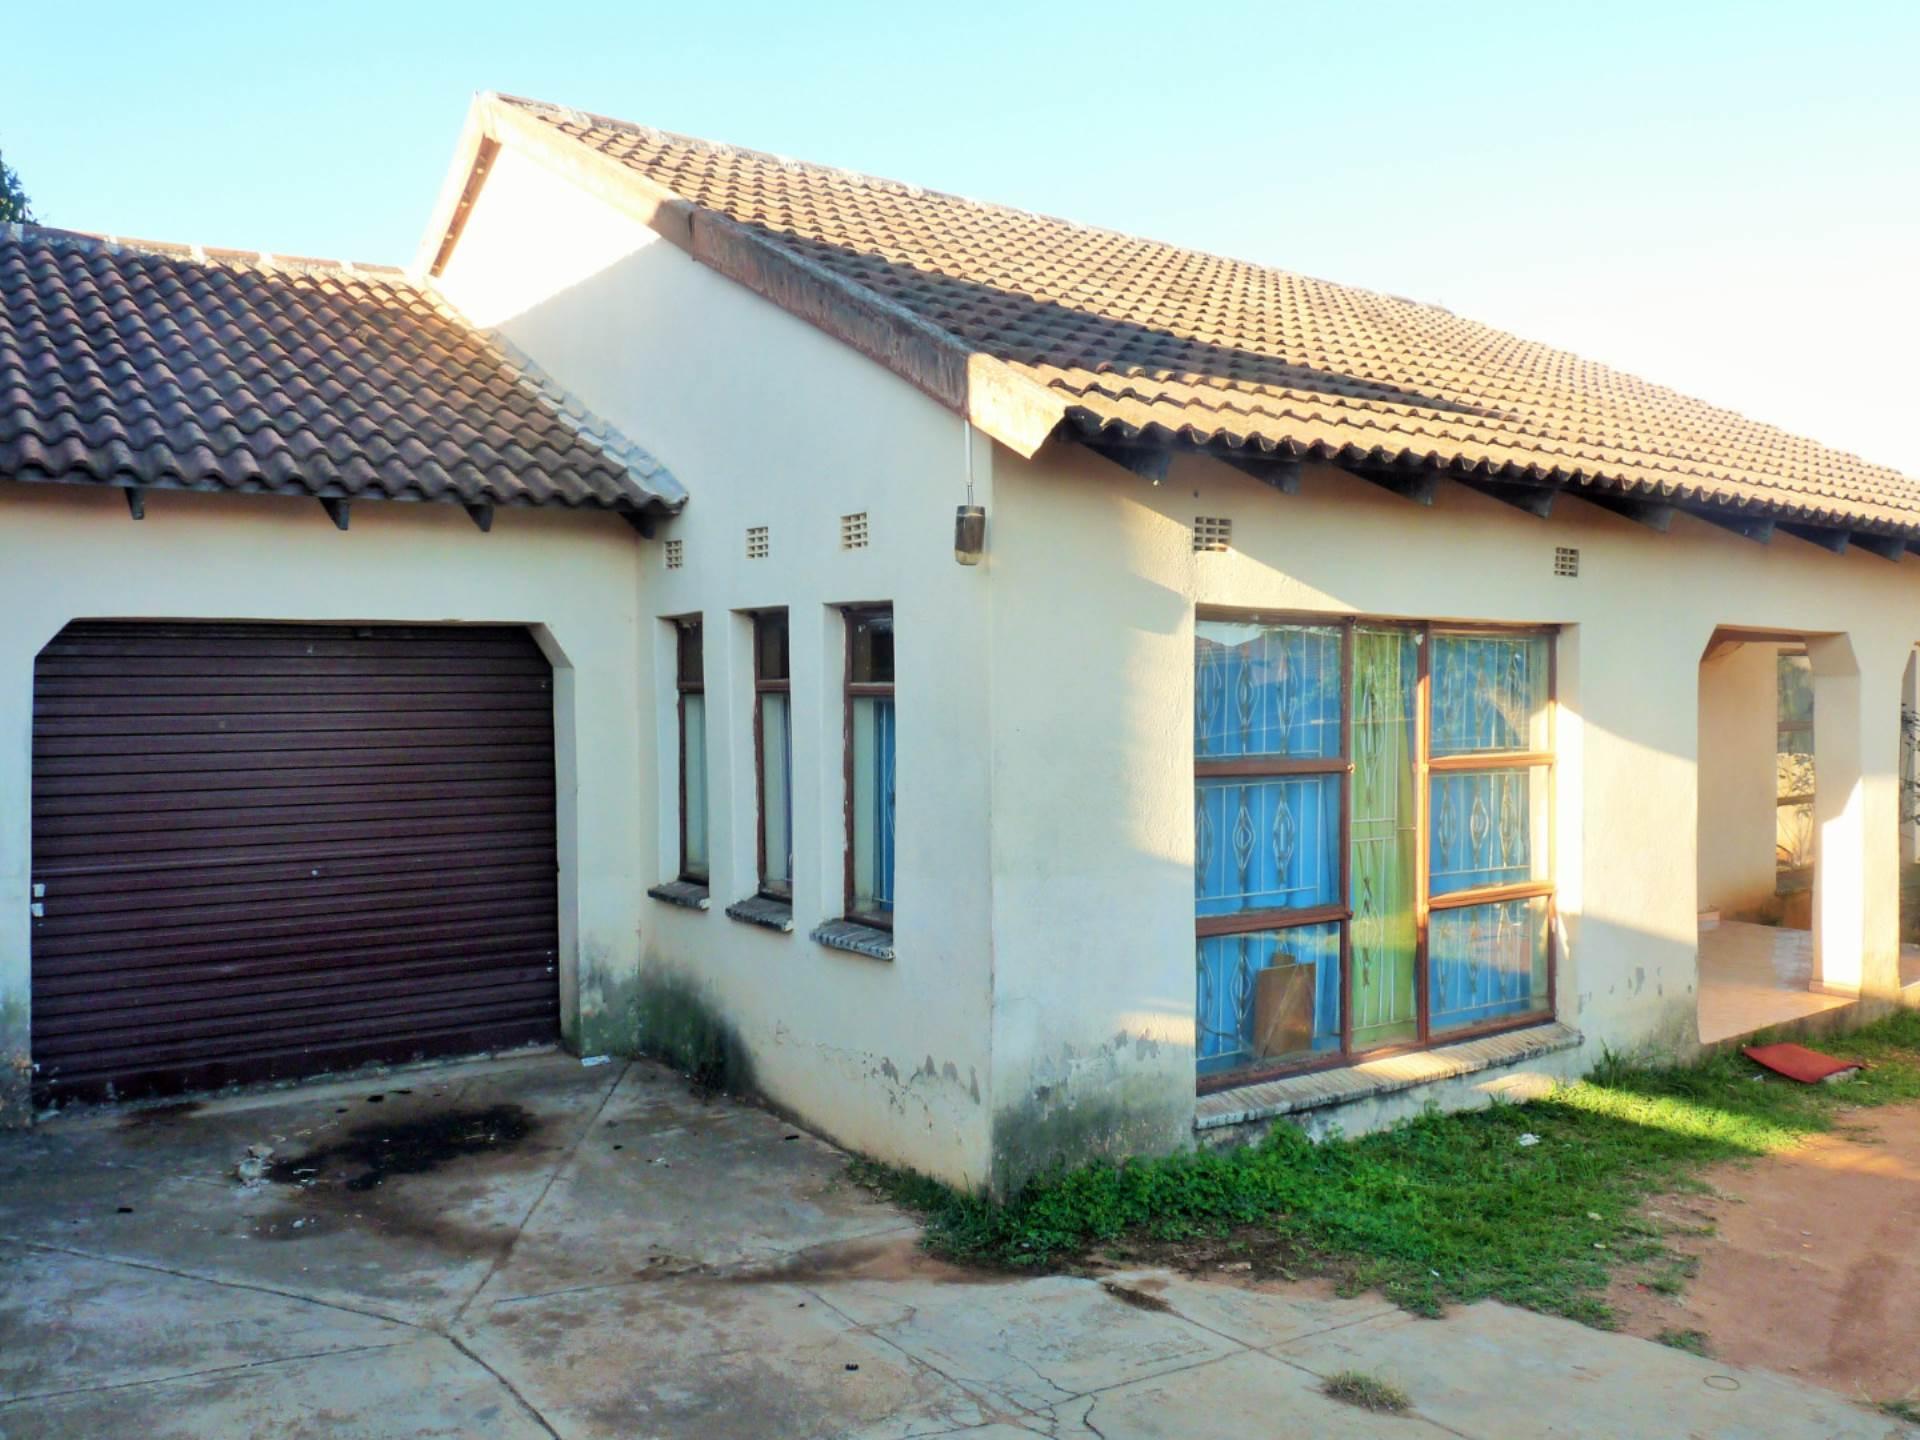 3 BedroomHouse For Sale In Bushbuckridge